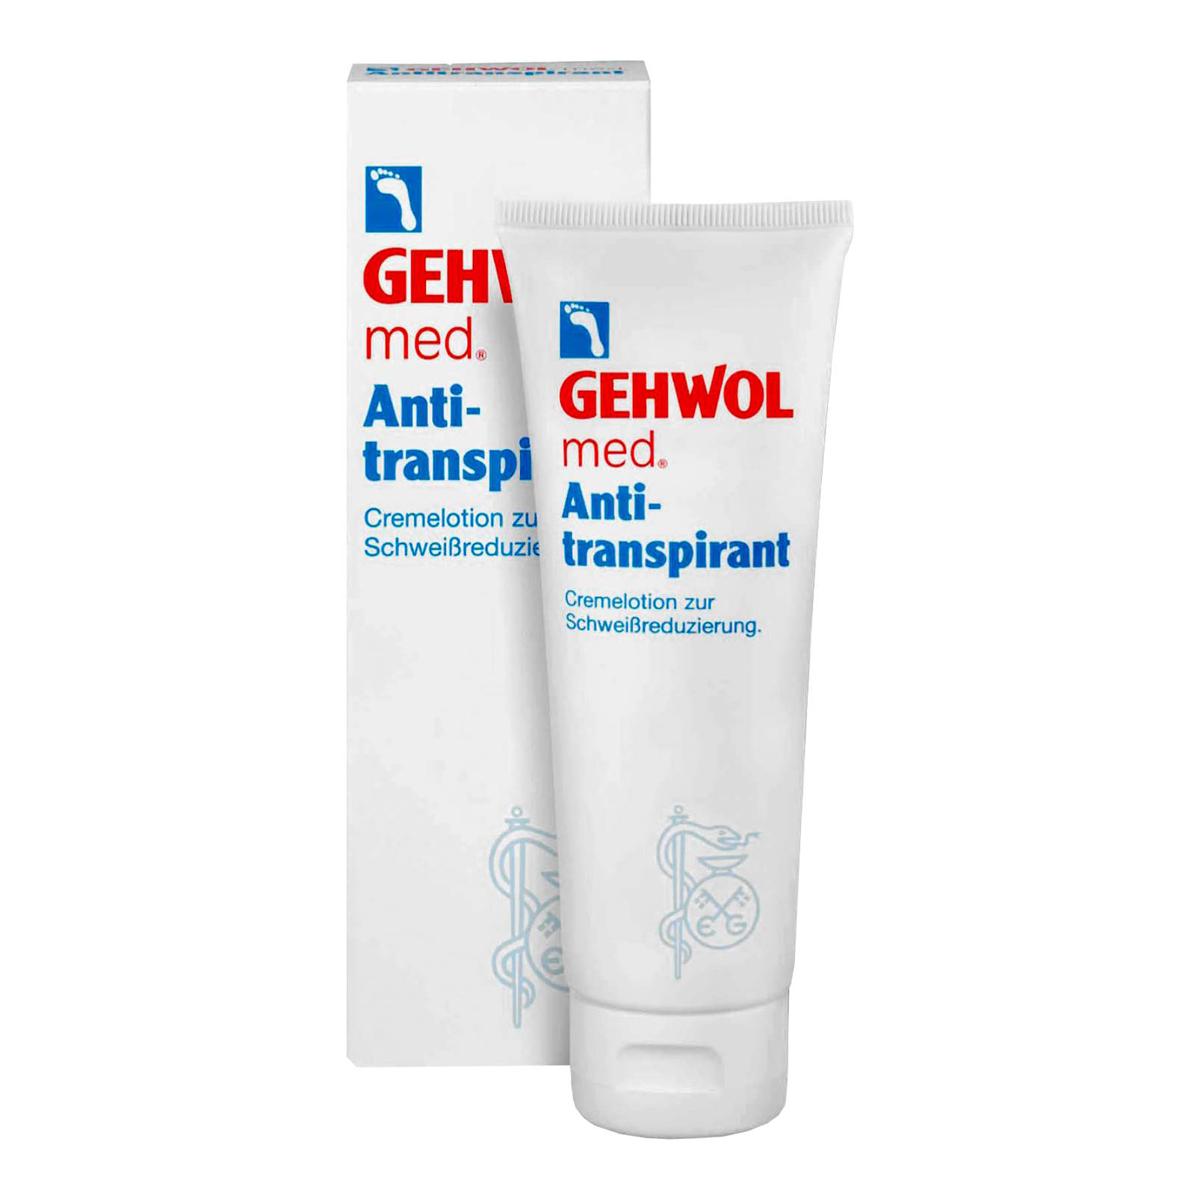 gehwol gerlachs fusskrem крем для уставших ног 75 мл Gehwol Anti-Transpirant - Крем-лосьон антиперспирант для ног 125 мл